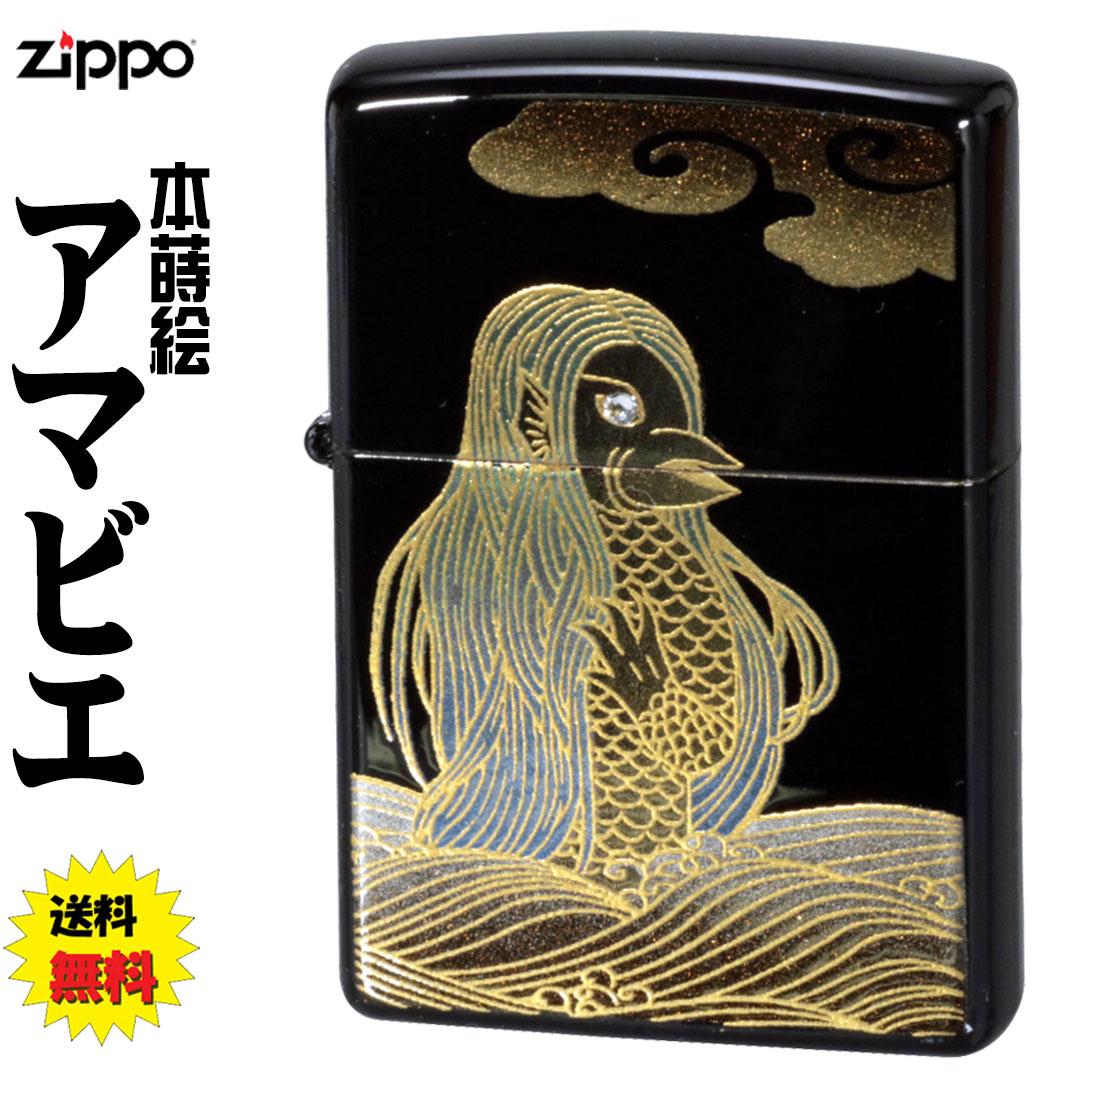 ZIPPO/本金蒔絵 アマビエ 全面漆塗り スワロフスキー貼り画像